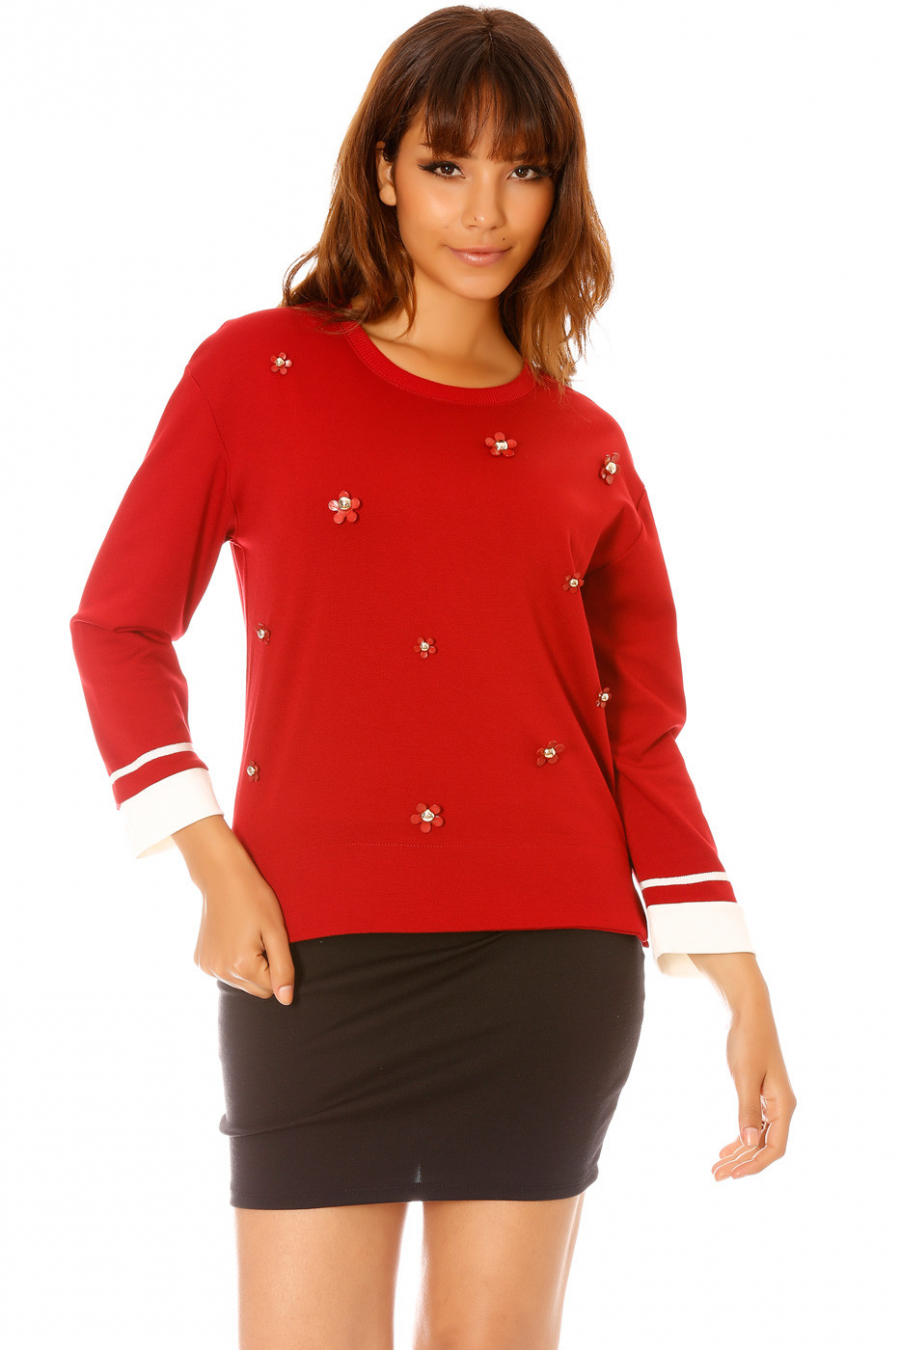 Burgundy sweatshirt with flower jewel. 2540